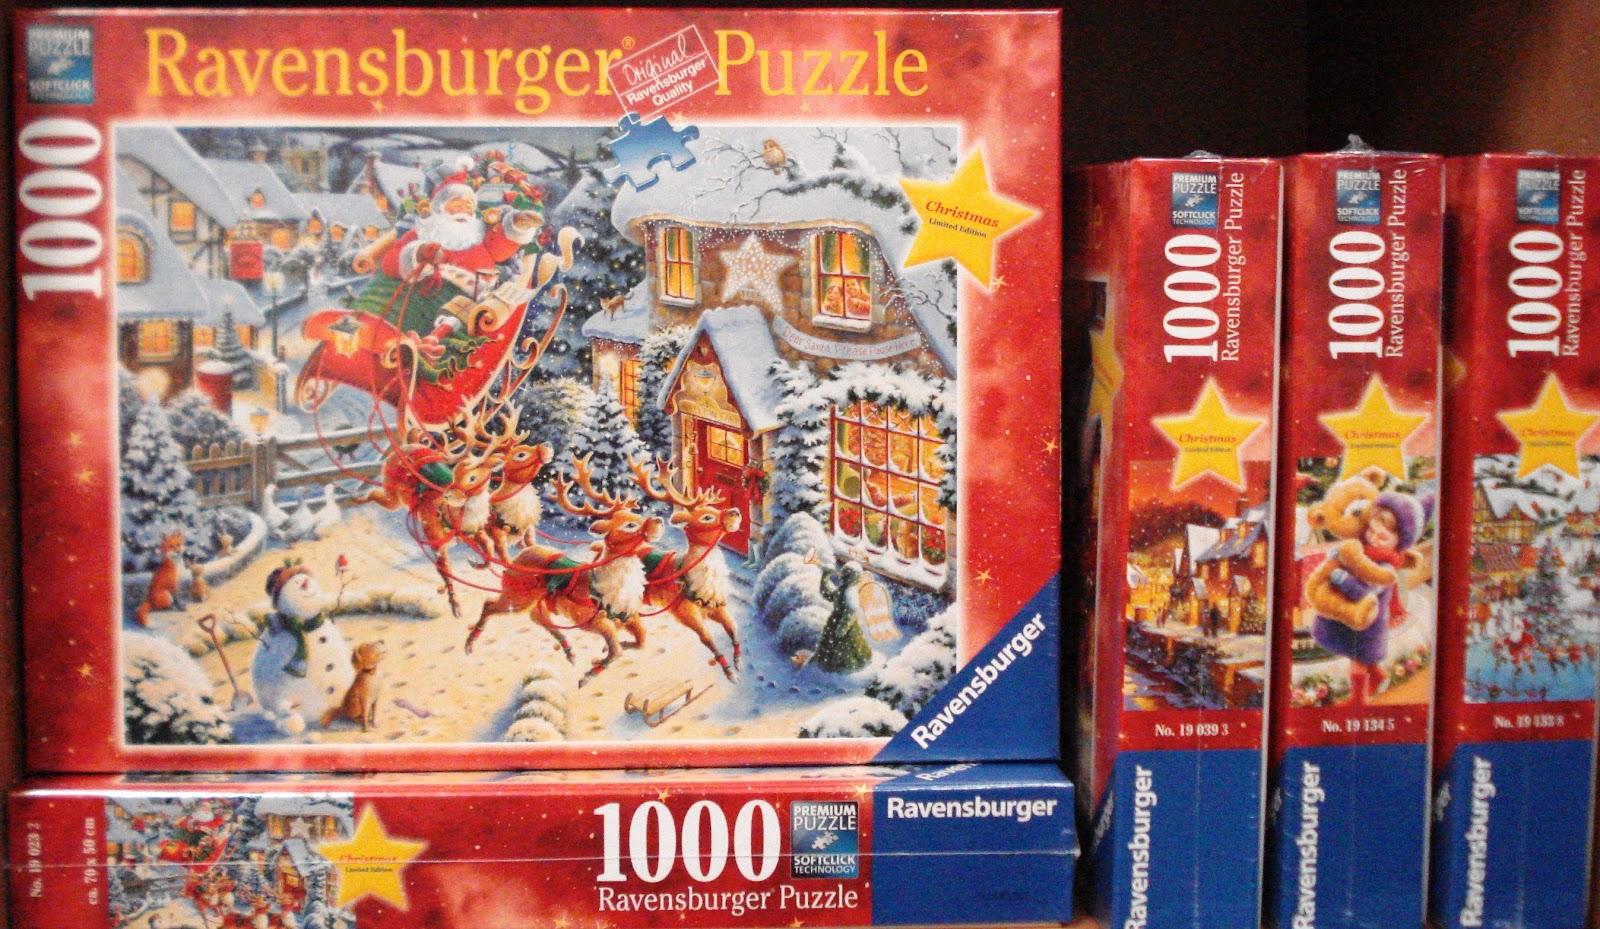 ravensburger christmas puzzle - Ravensburger Christmas Puzzles